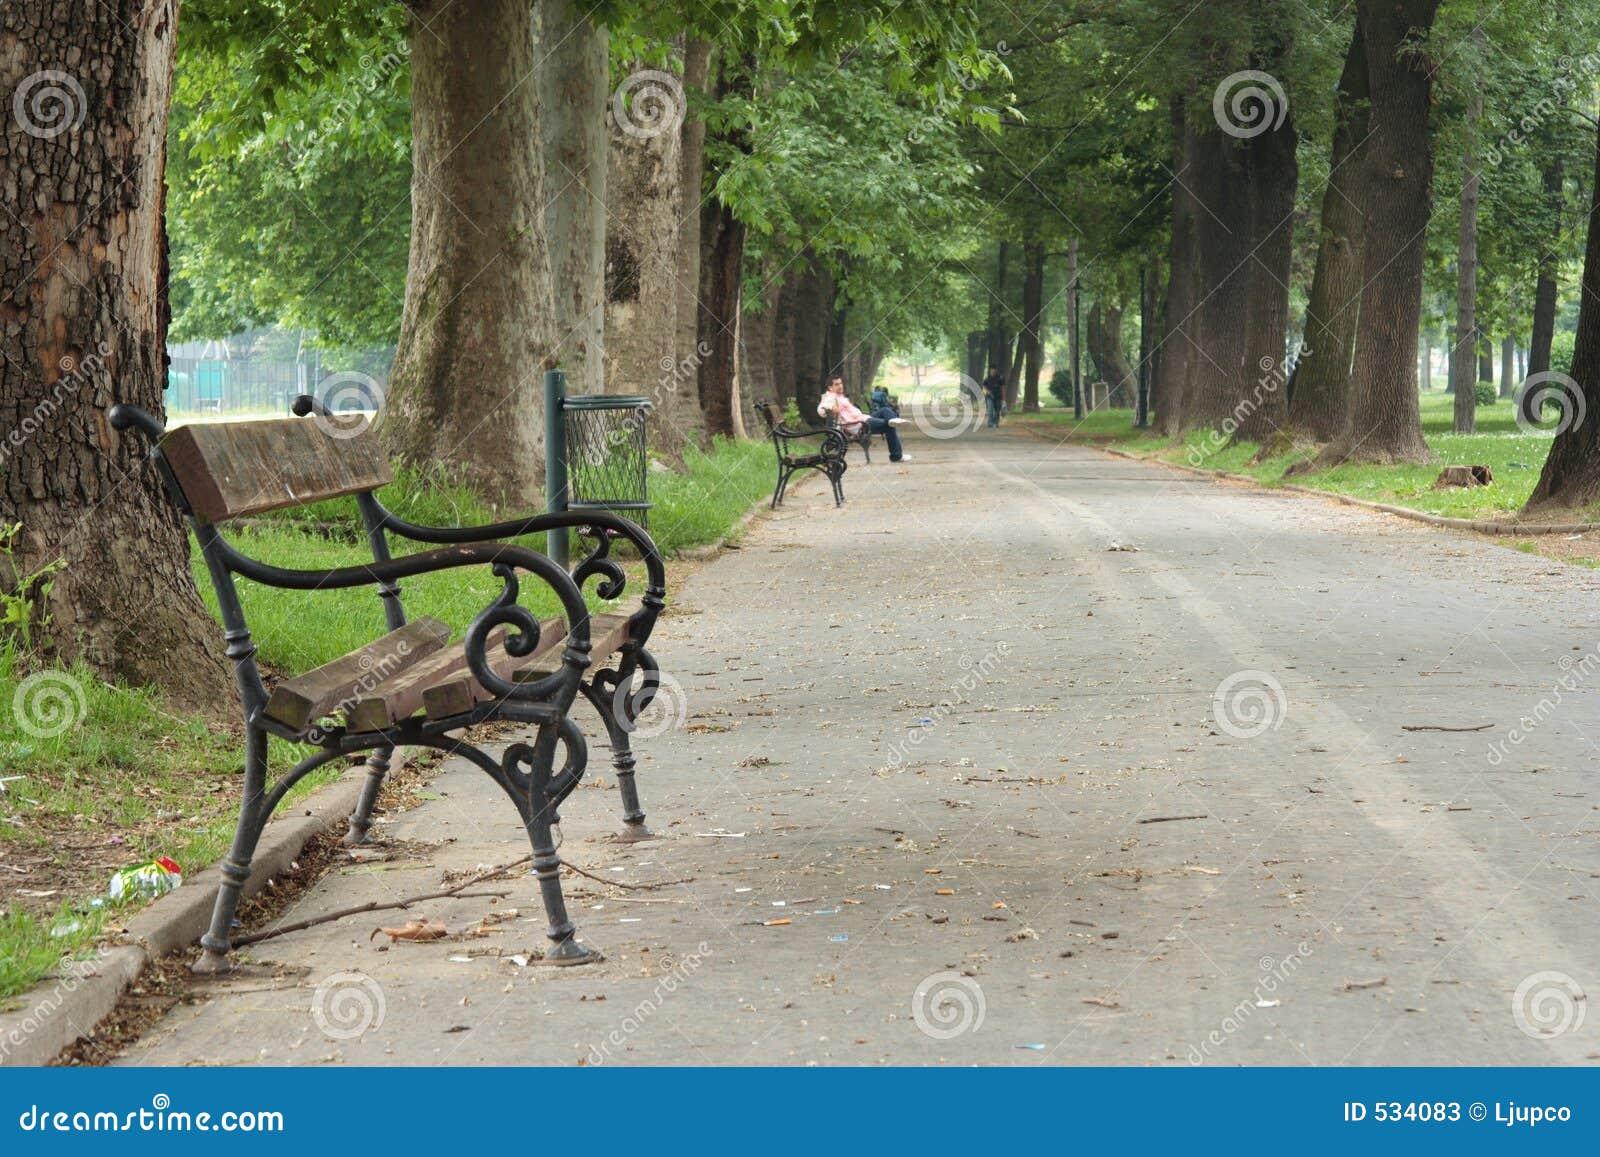 Download 长凳空的公园 库存图片. 图片 包括有 孤独, beautifuler, 废弃物, 叶子, 垃圾, 金属, 安静 - 534083